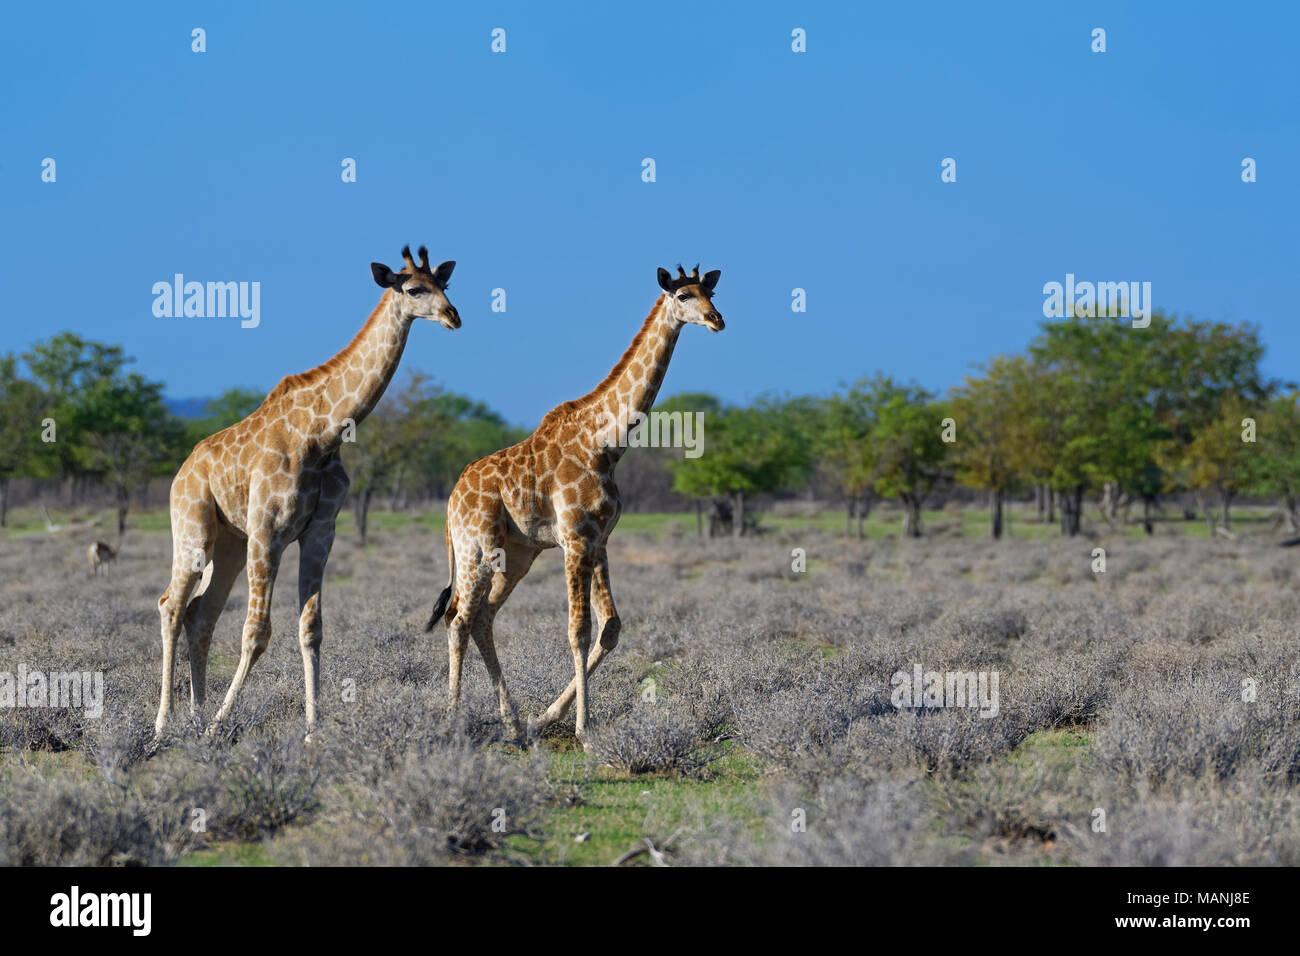 Namibian giraffes or Angolan giraffes (Giraffa camelopardalis angolensis), two young walking, Etosha National Park, Namibia, Africa - Stock Image